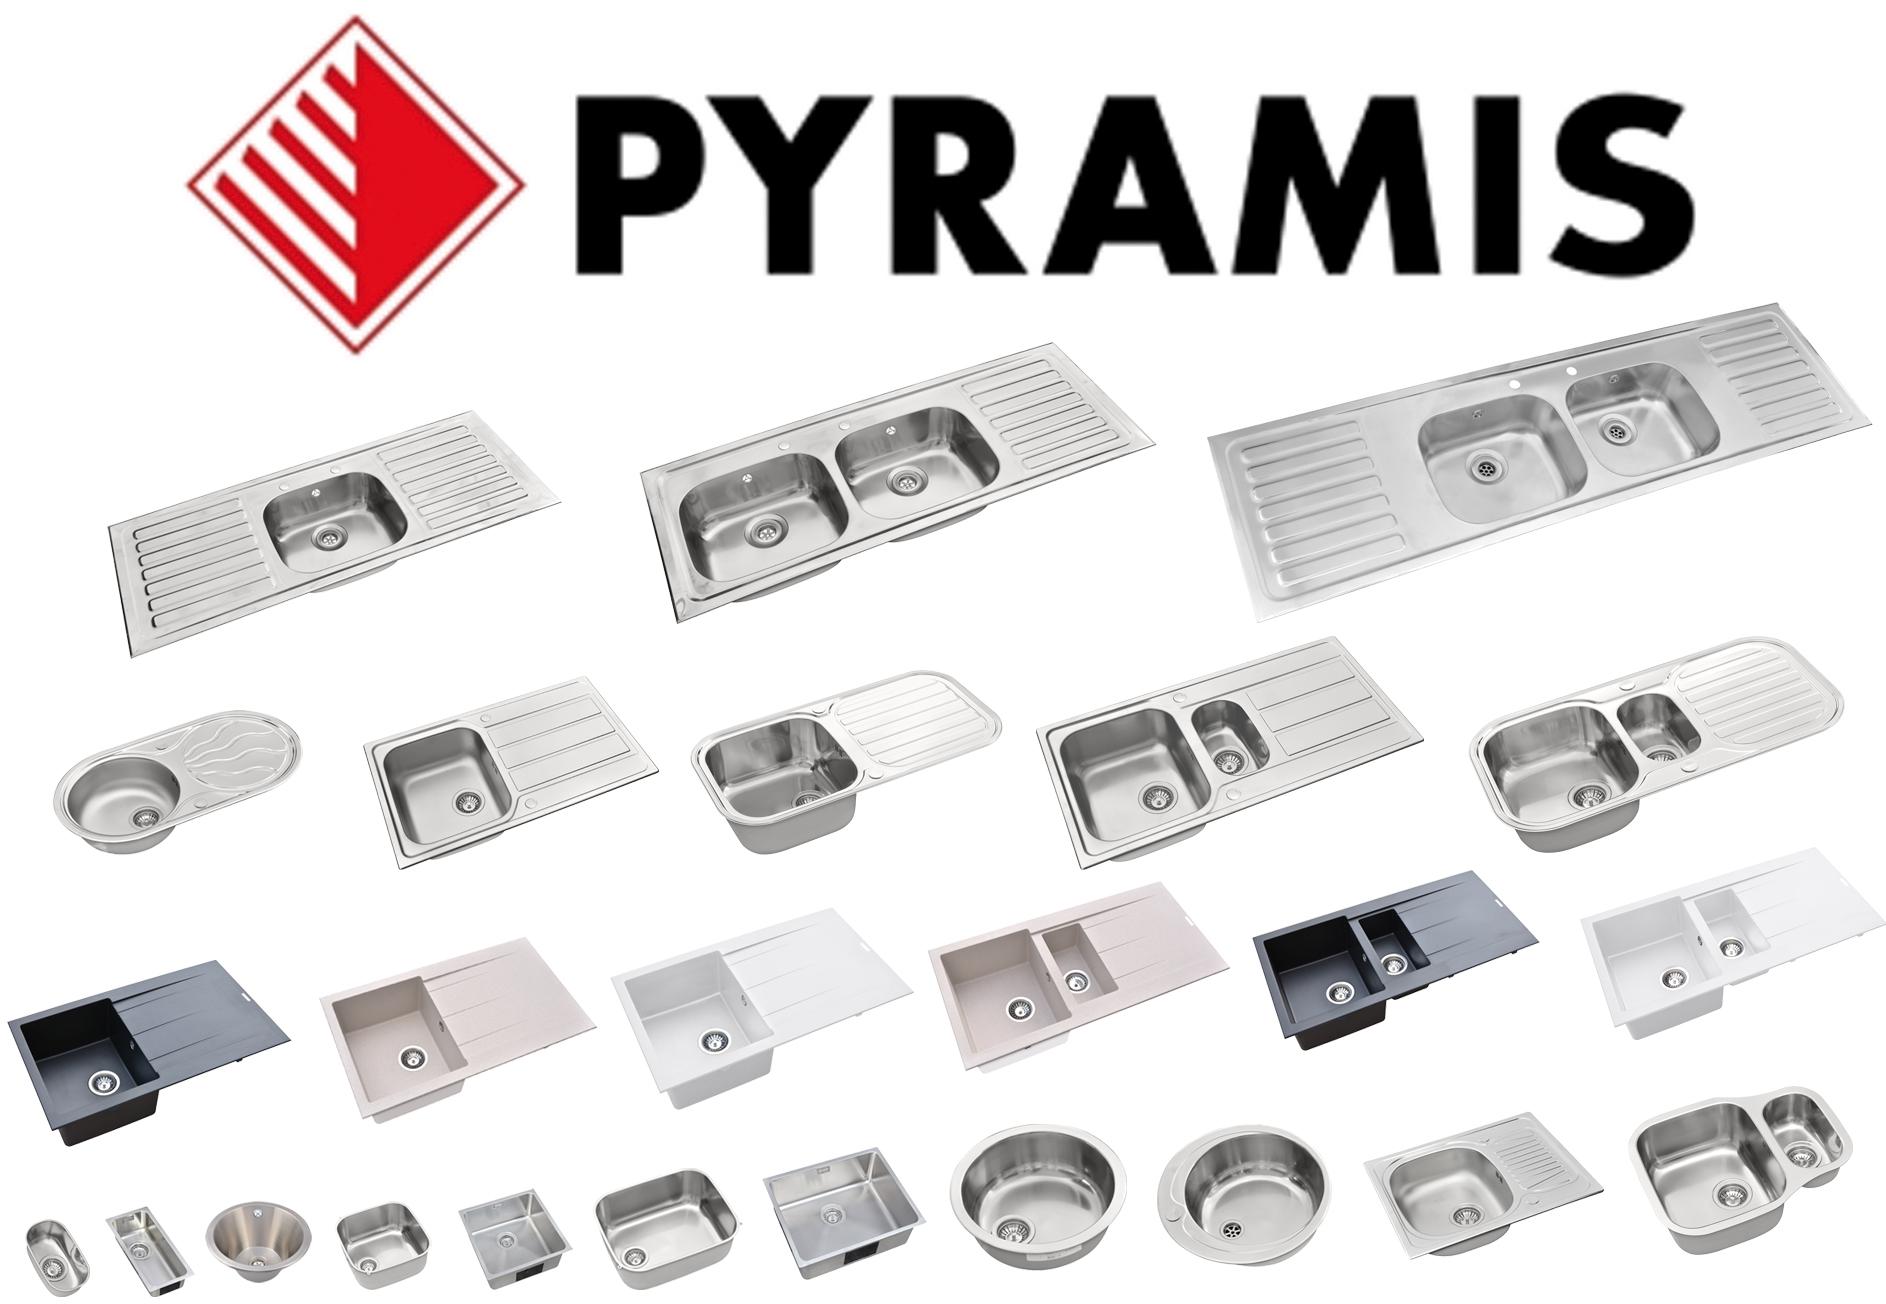 Installing Pyramis Sinks Videos